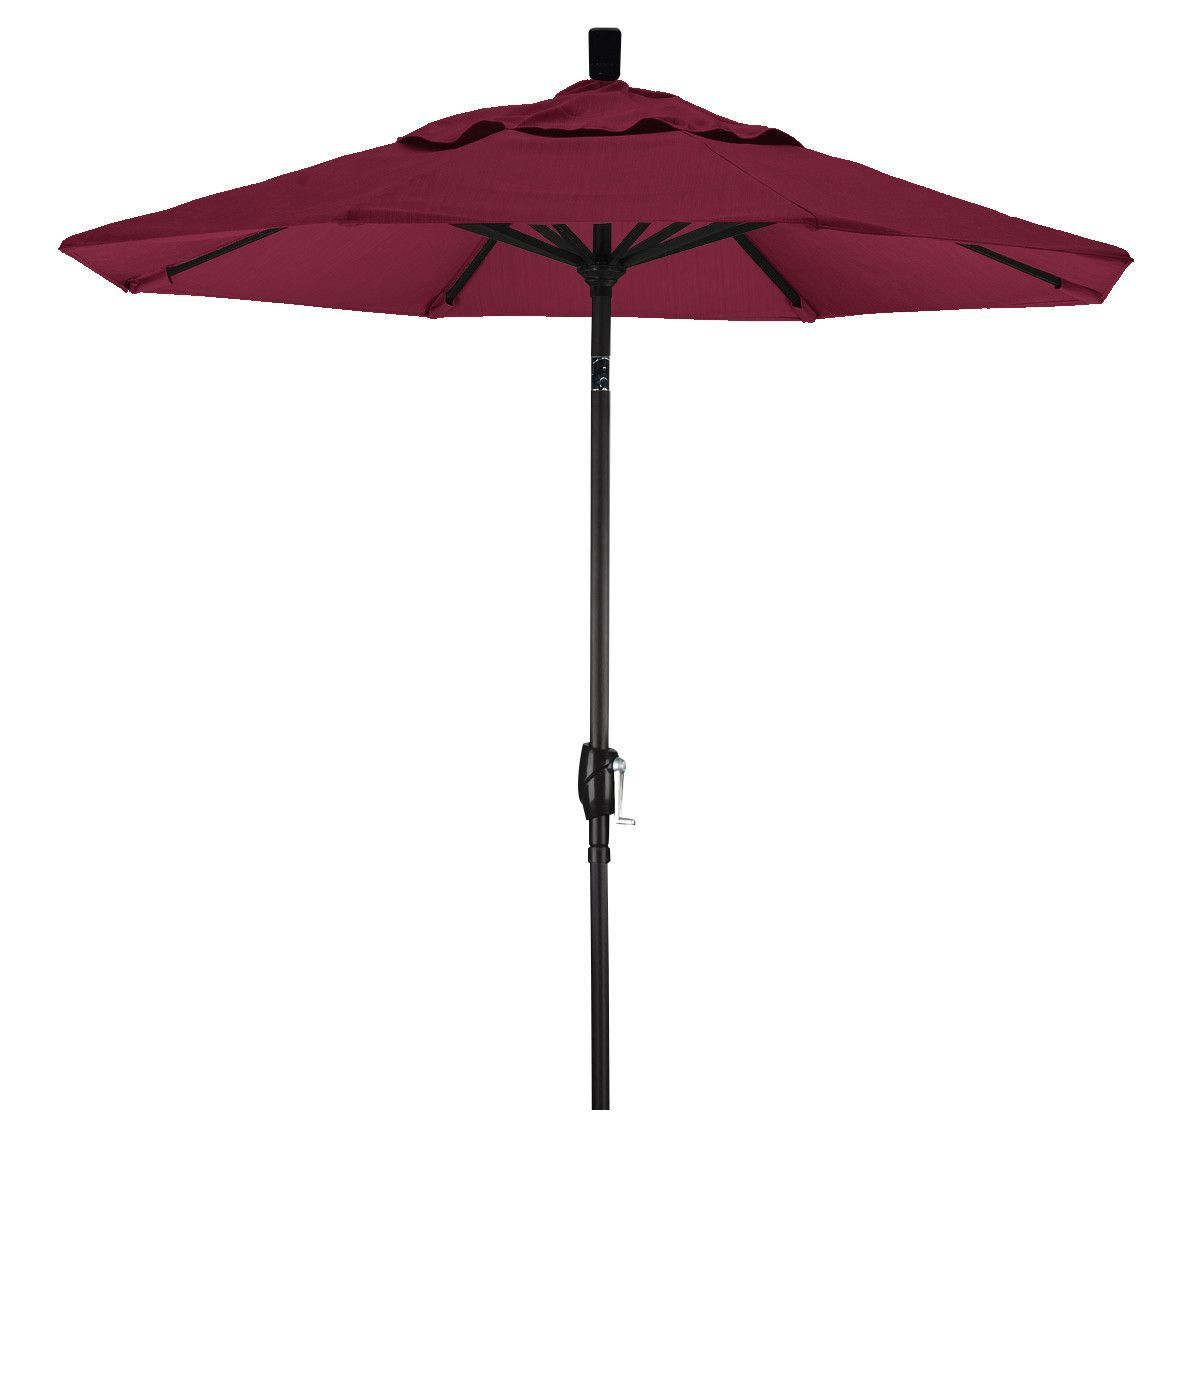 Eclipse Collection 7.5' Aluminum Market Umbrella Push Tilt M Black/Pacifica/Burgandy